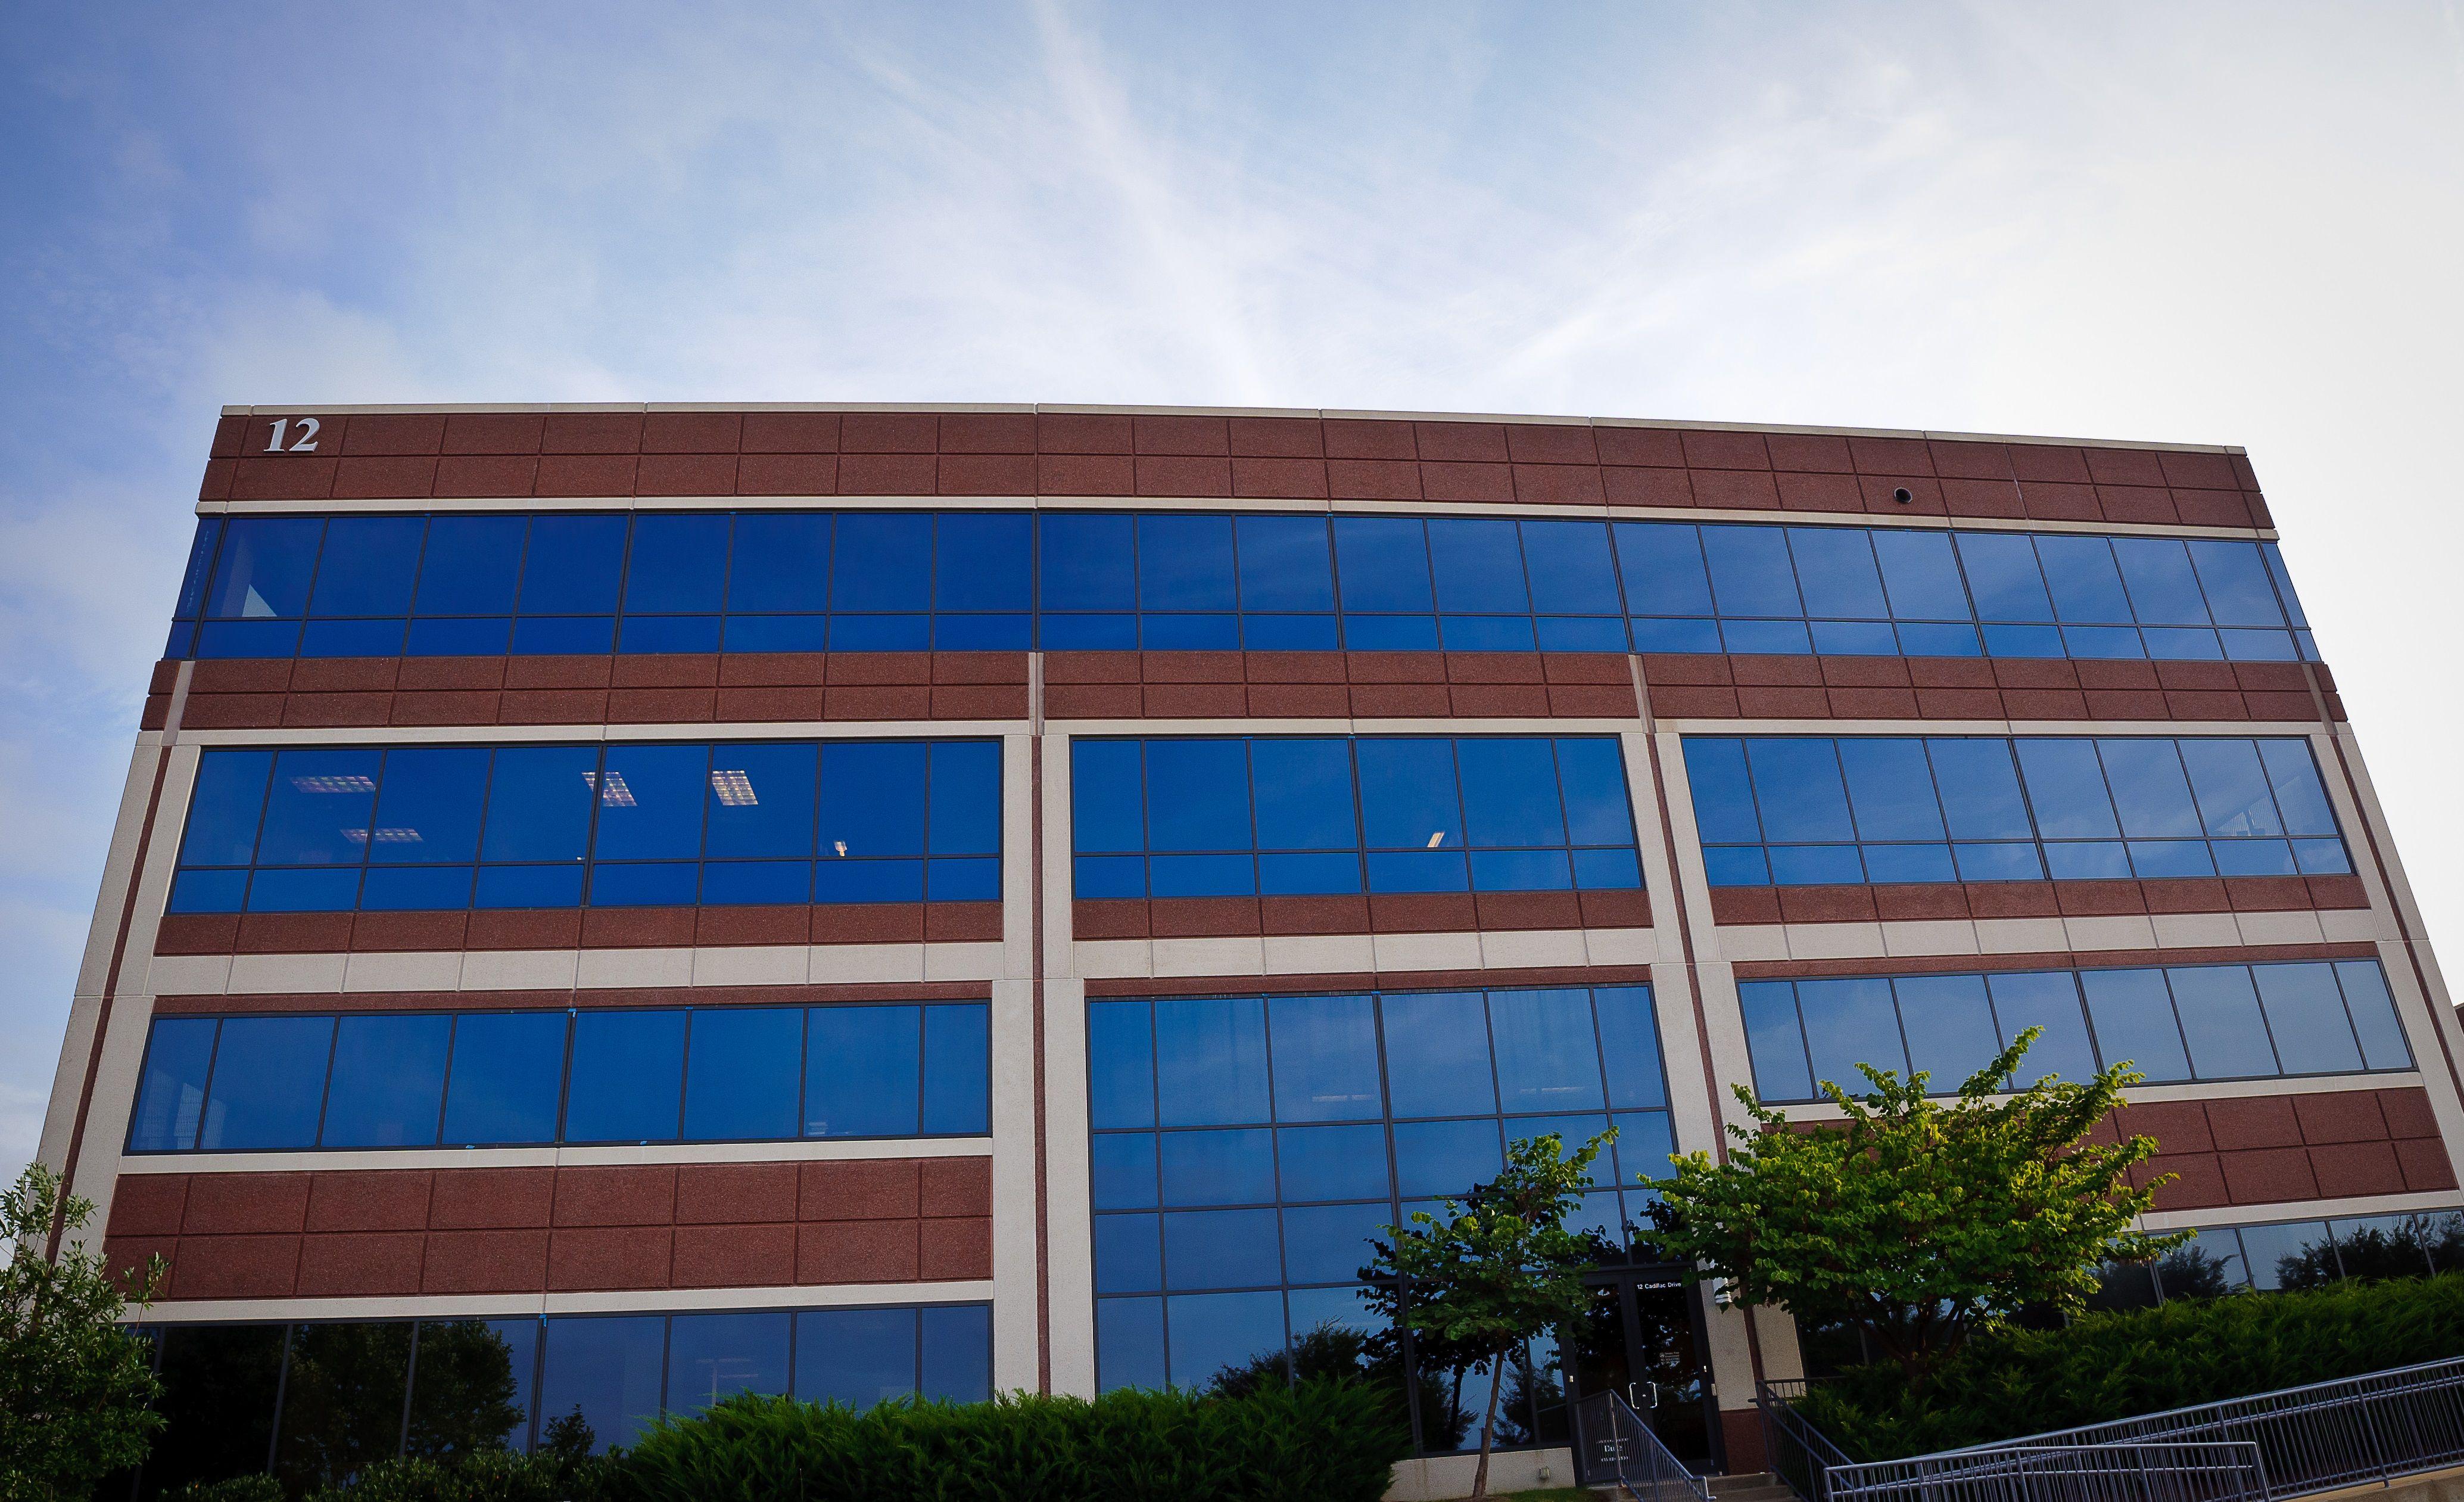 BKT opens new OTR headquarters